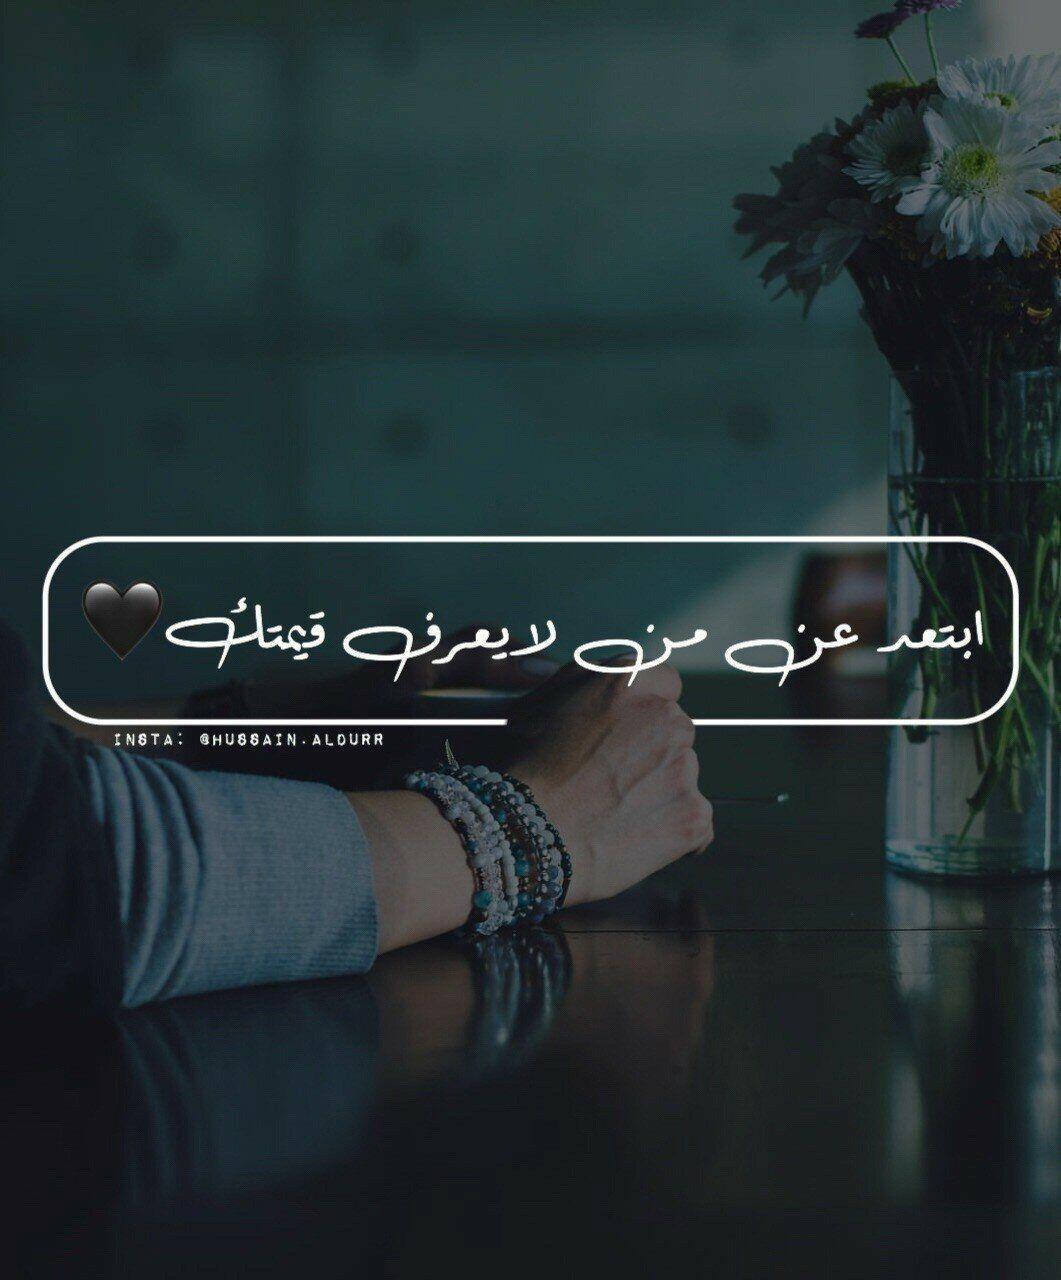 رمزيات حكم أقوال اقتباسات حالات واتساب ابتعد عن من لا يعرف قيمتك Beautiful Arabic Words Wise Quotes Arabic Quotes